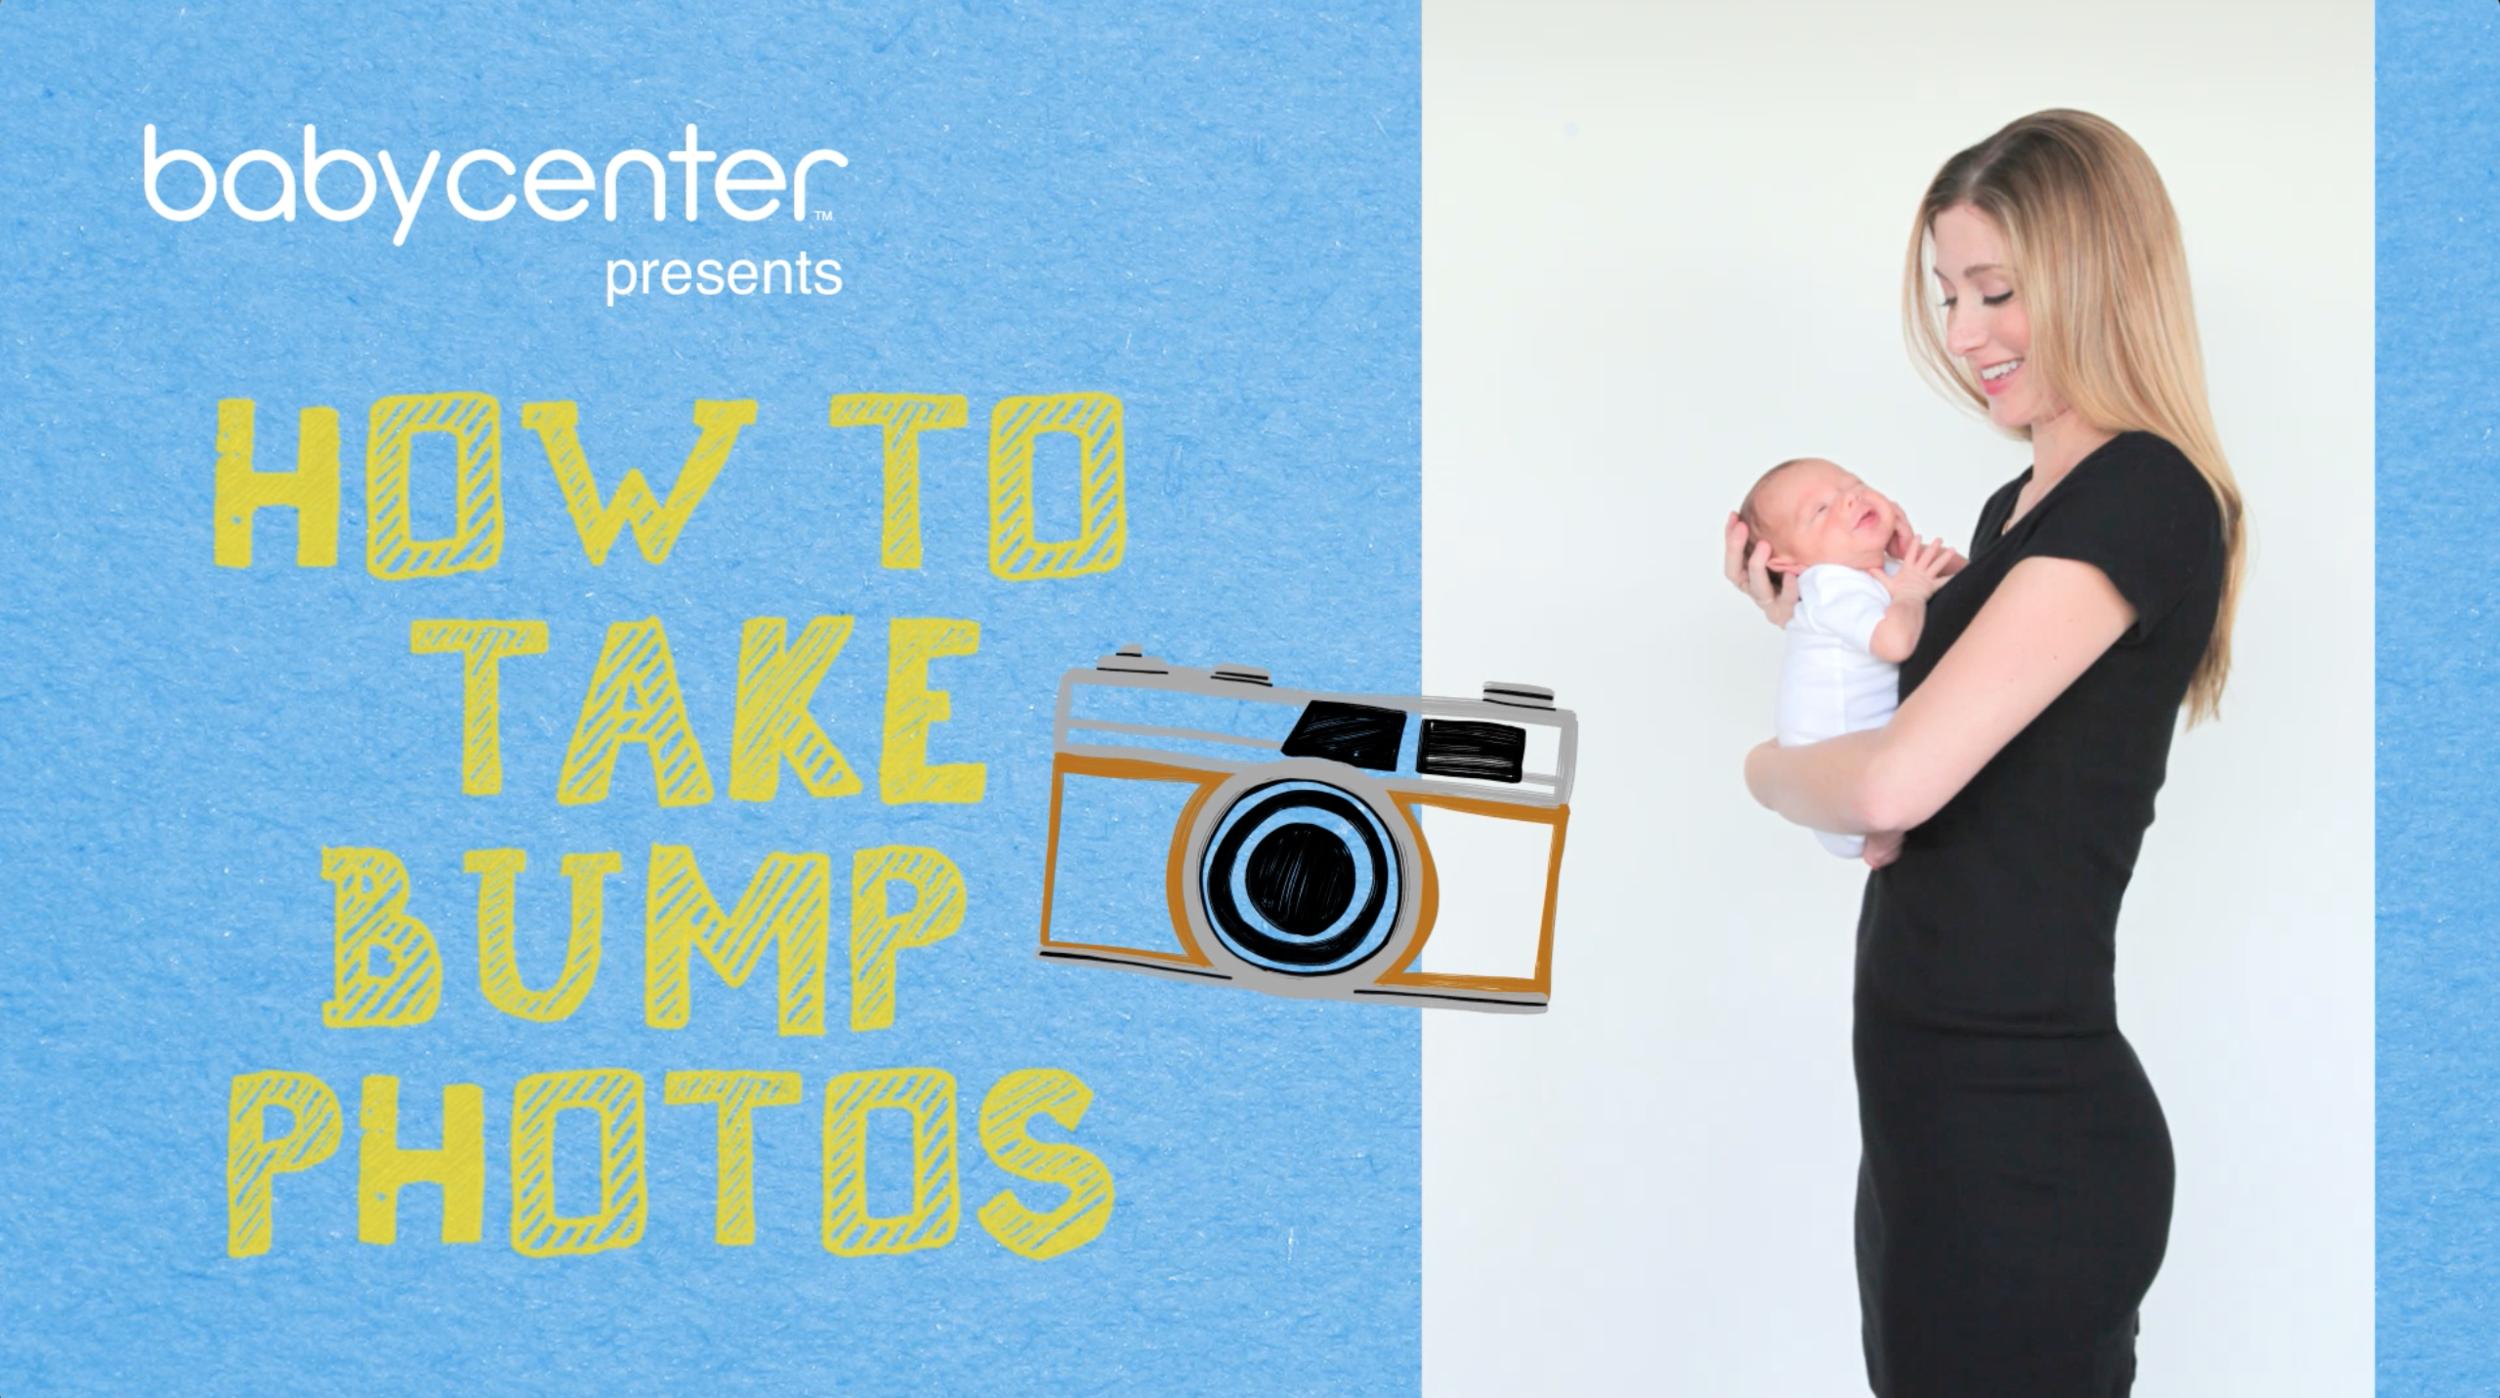 HOW TO TAKE BUMP PHOTOS